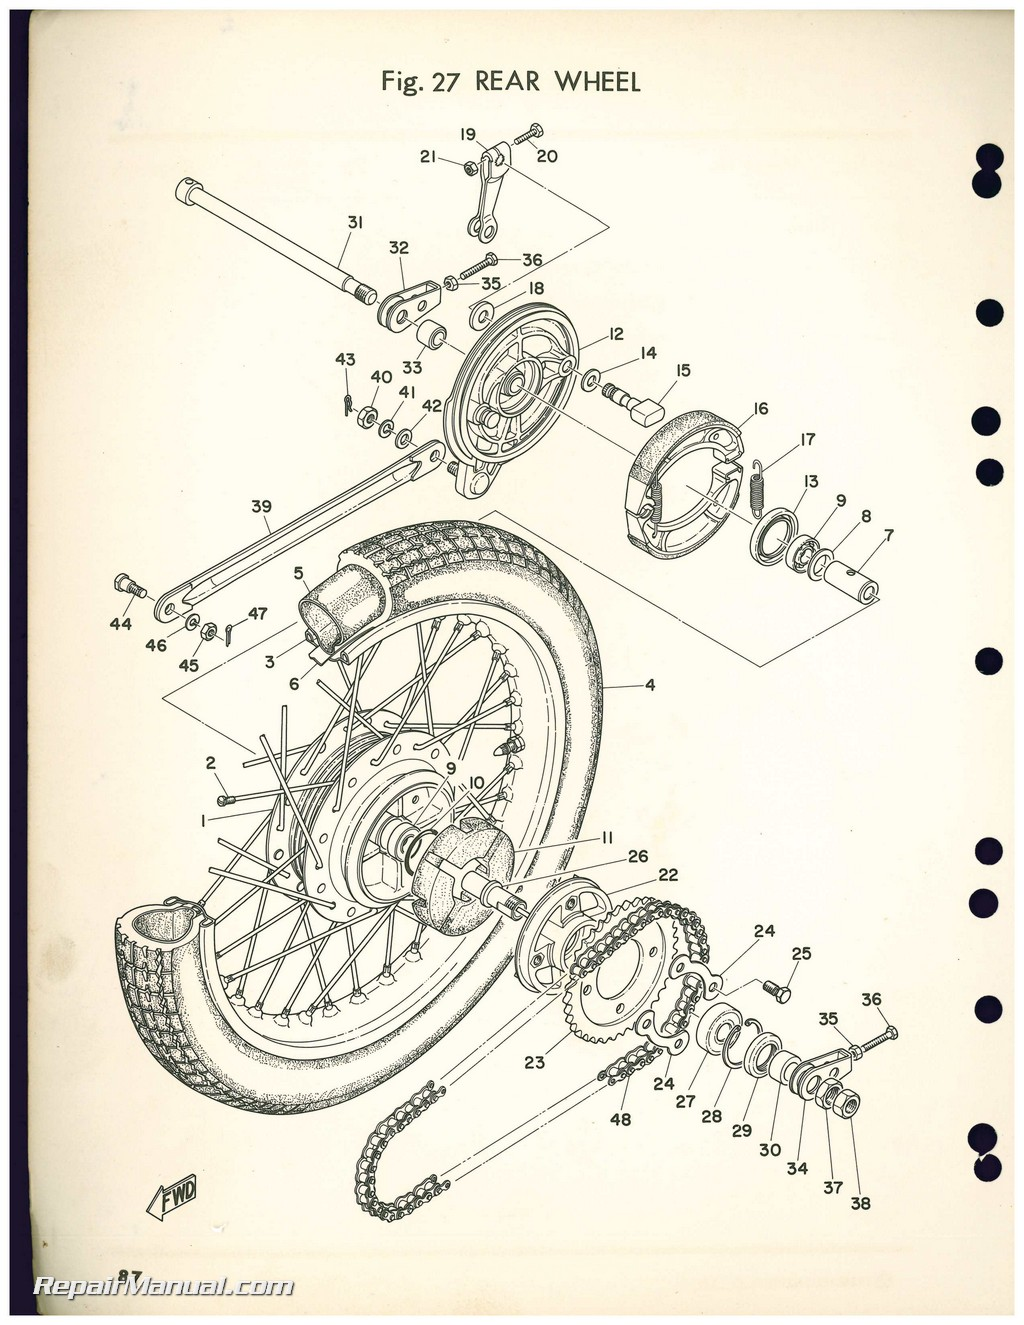 Used 1972 yamaha cs5 200cc motorcycle parts manual for New yamaha motorcycle parts